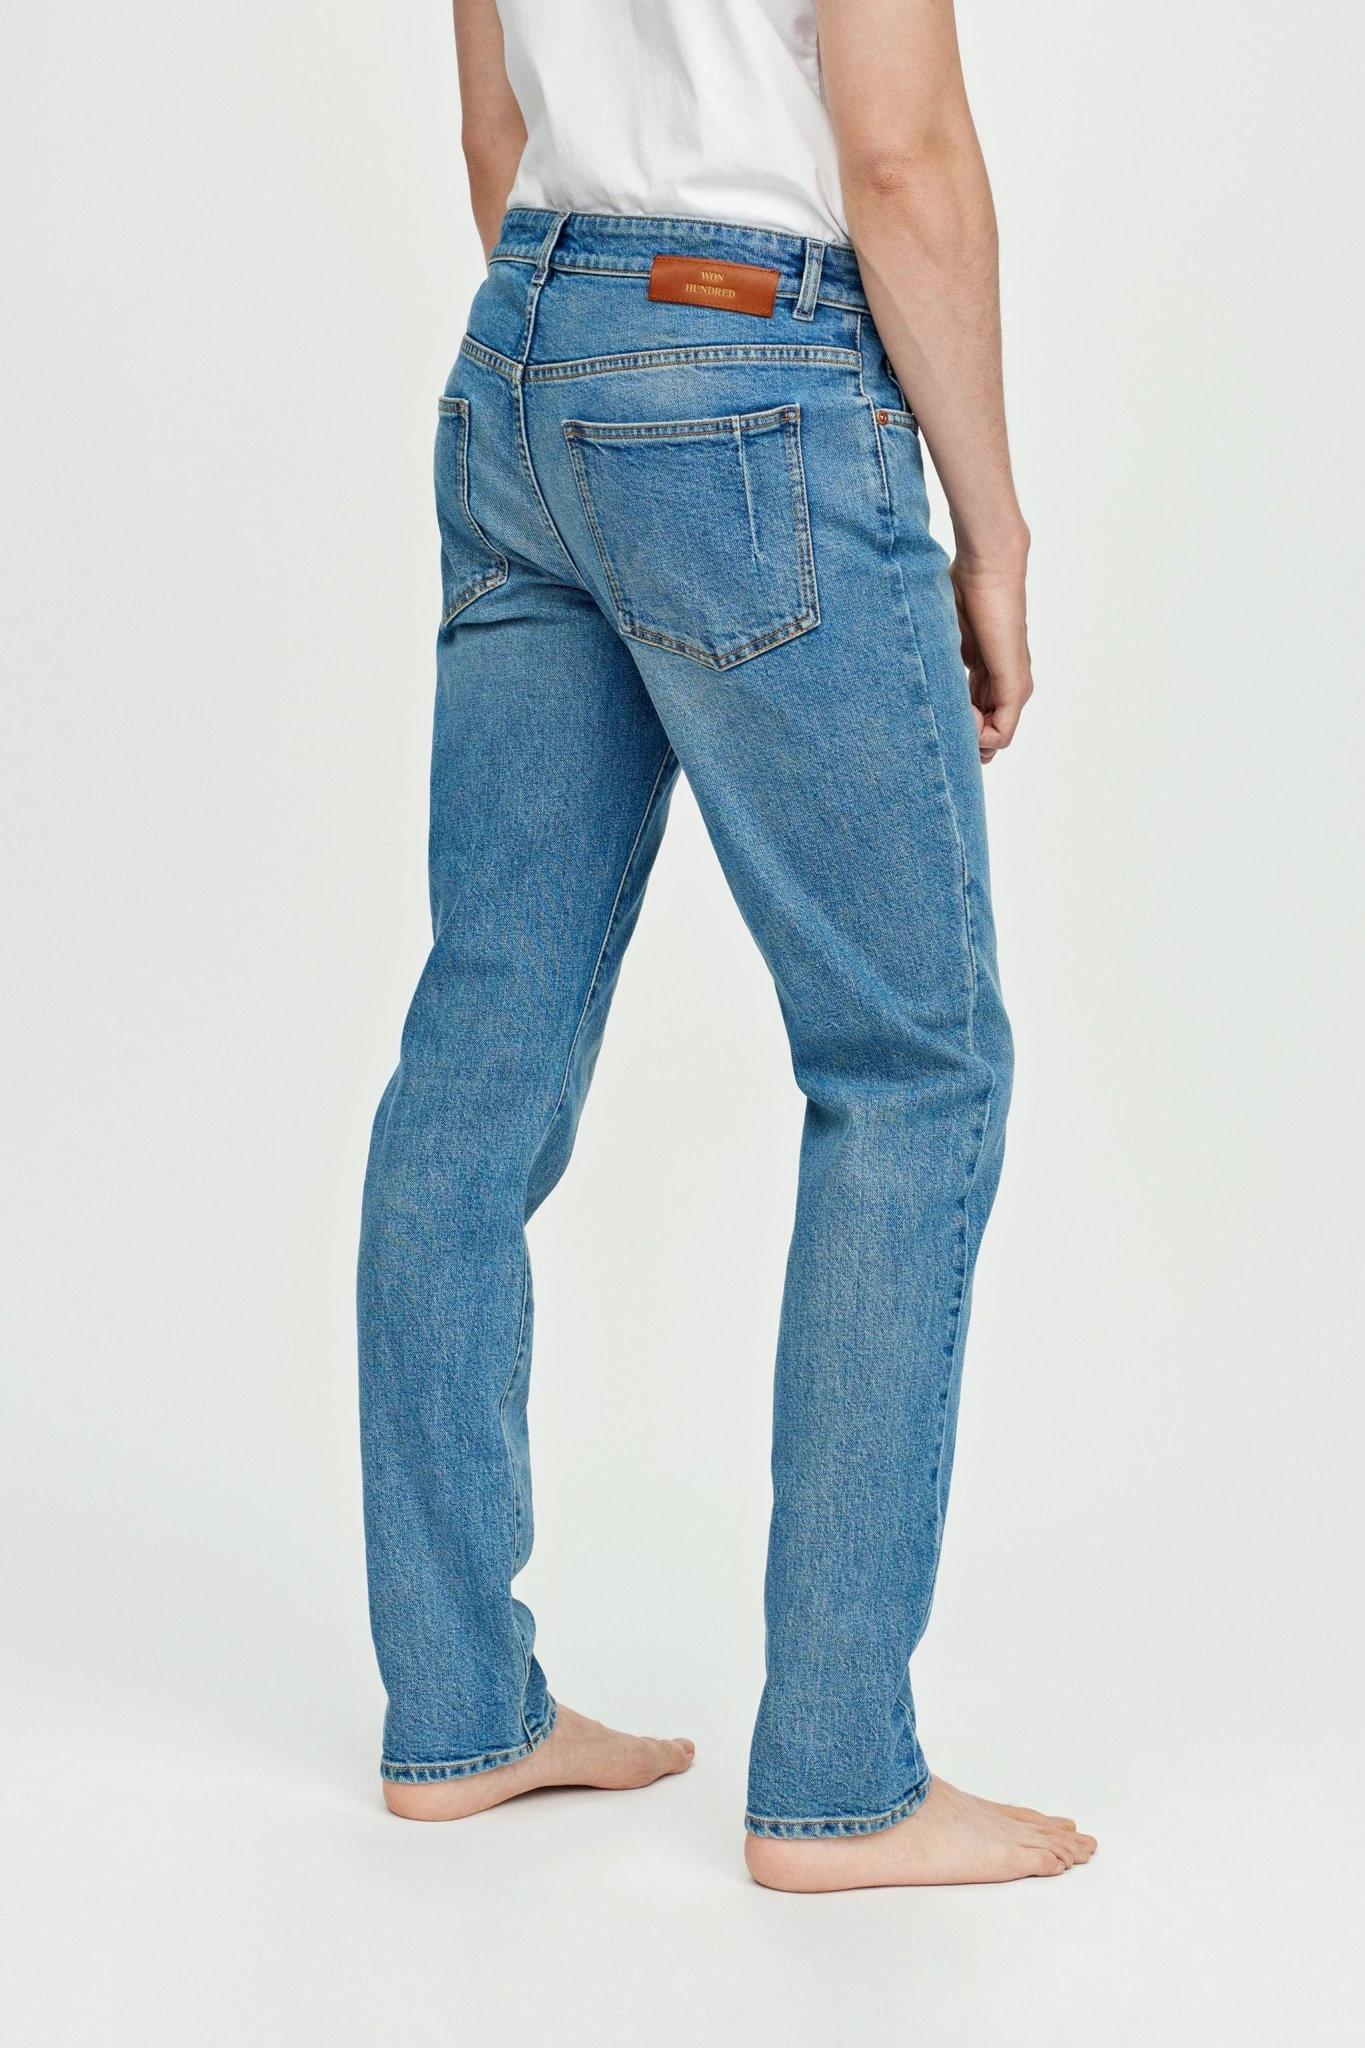 Shady B Jeans - True Blue 6-2